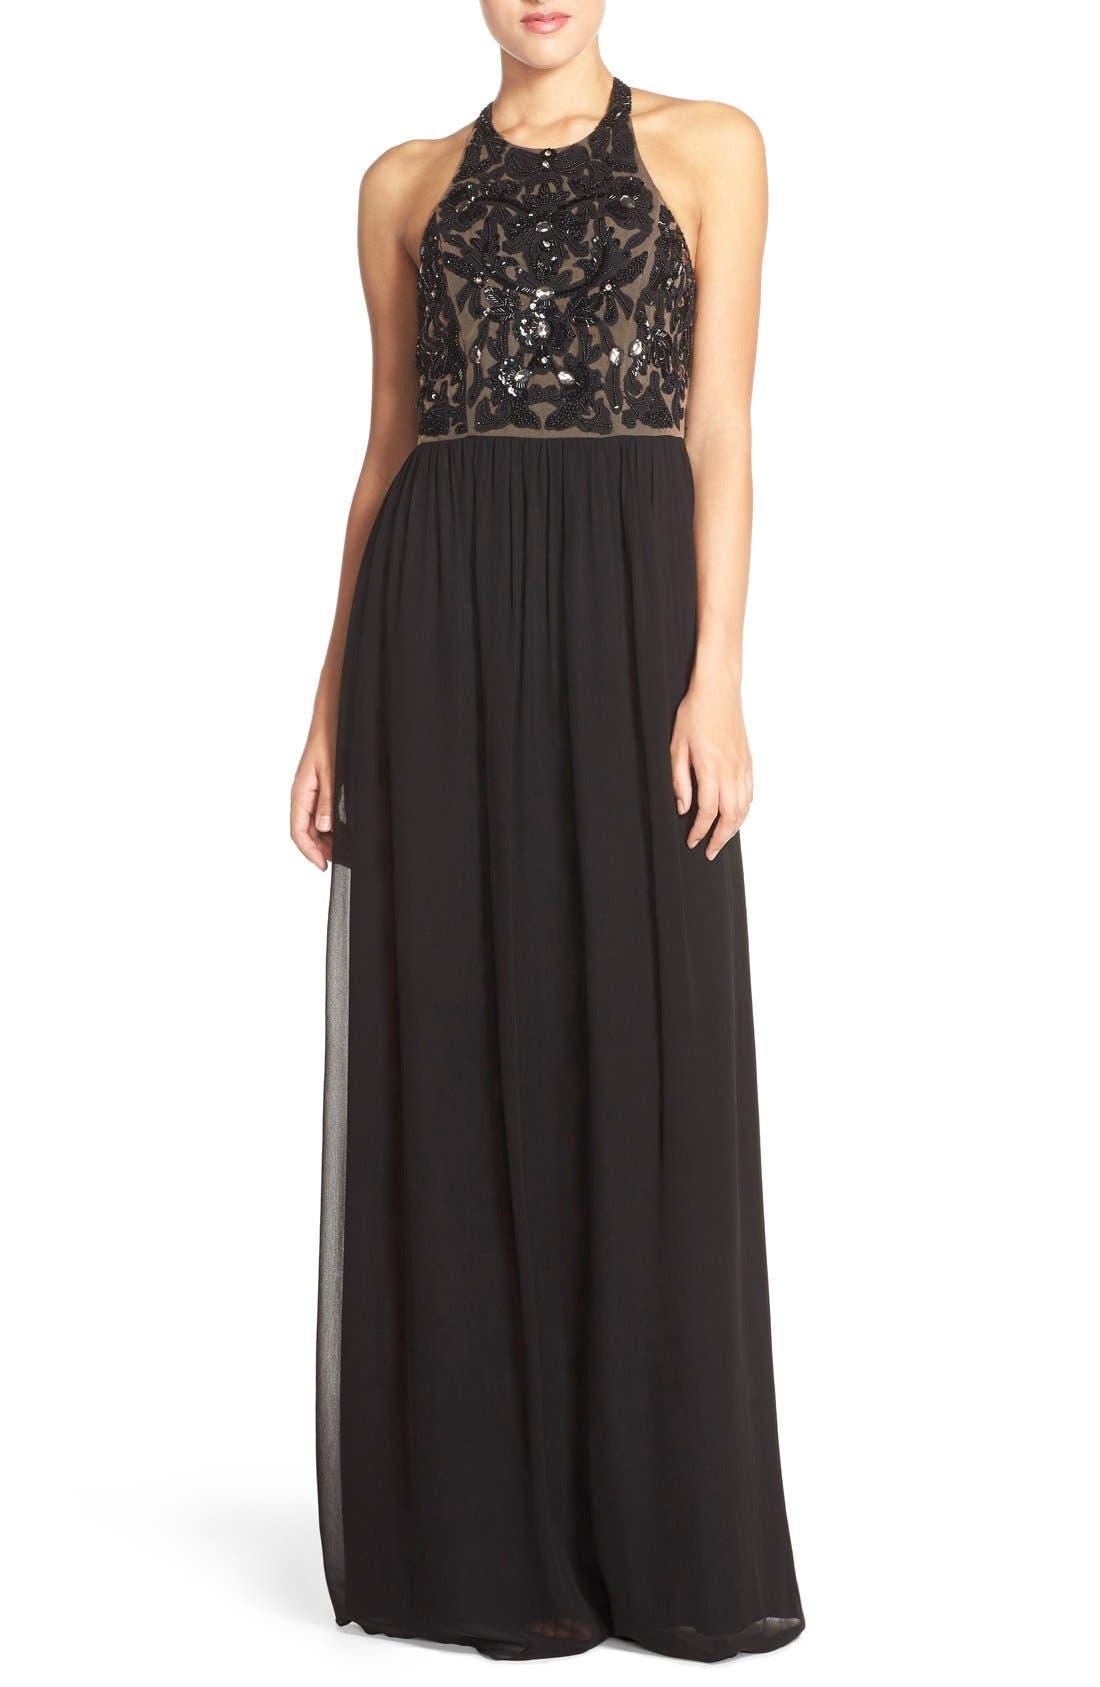 Main Image - Parker 'Cassey' Embellished Bodice Halter Style Gown